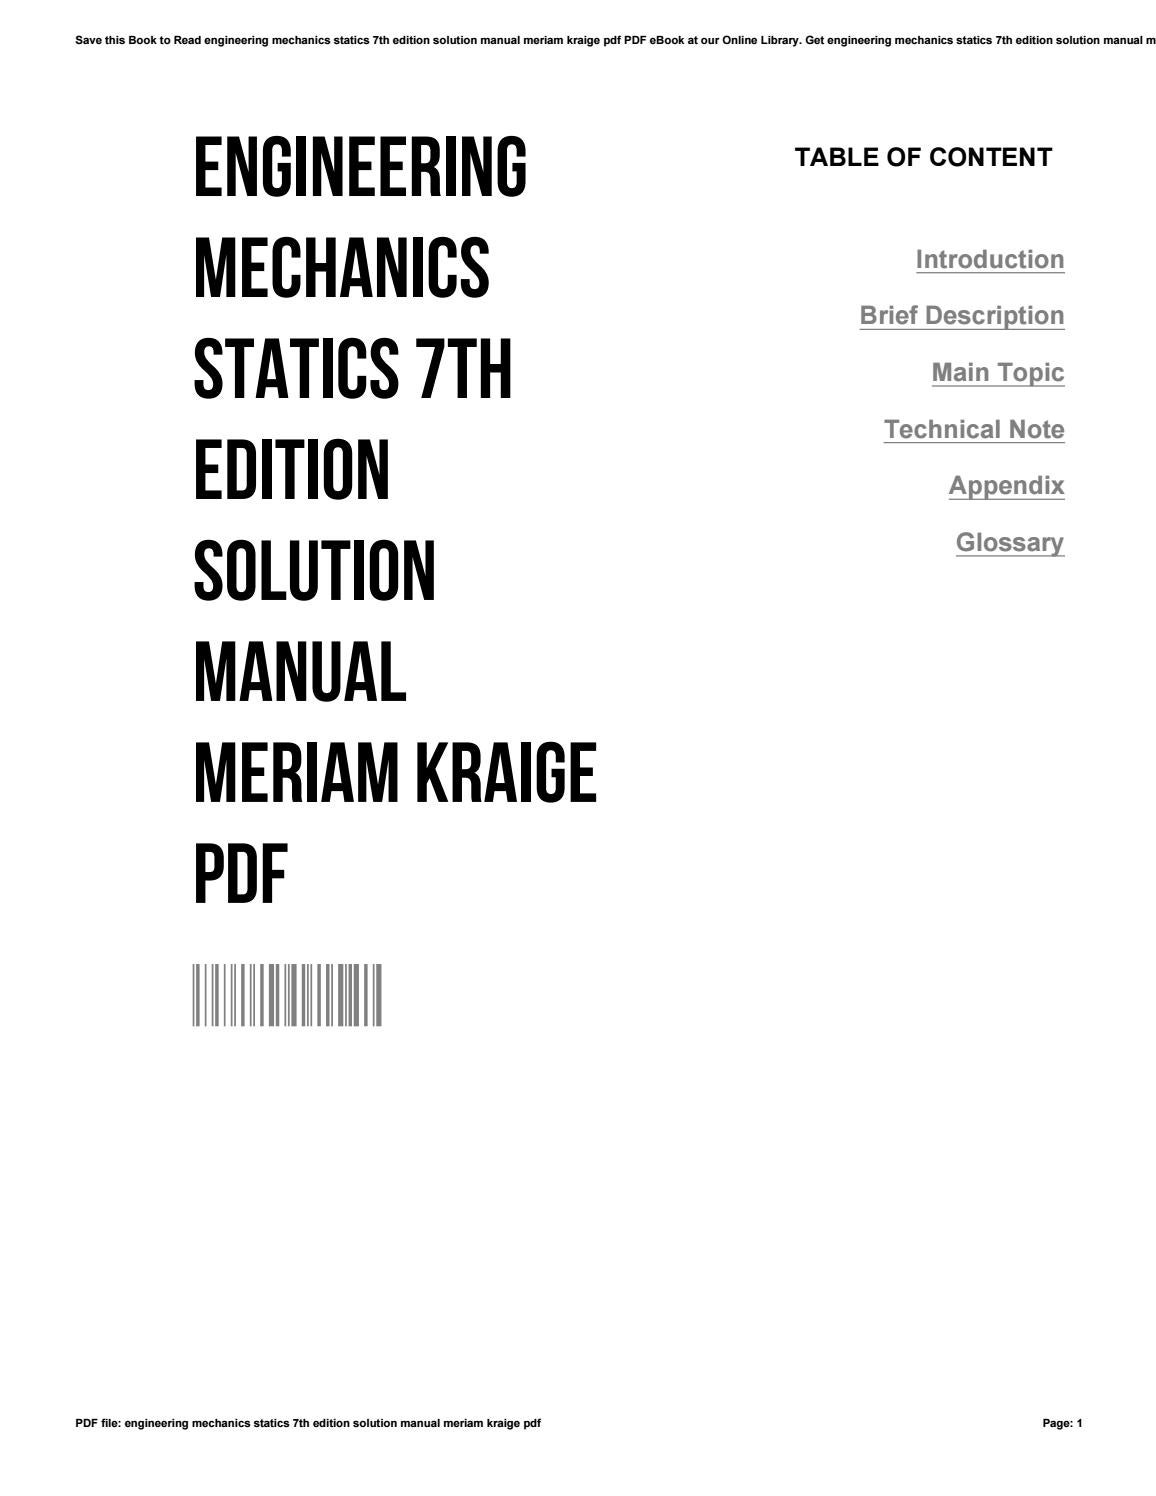 Engineering mechanics statics 7th edition solution manual